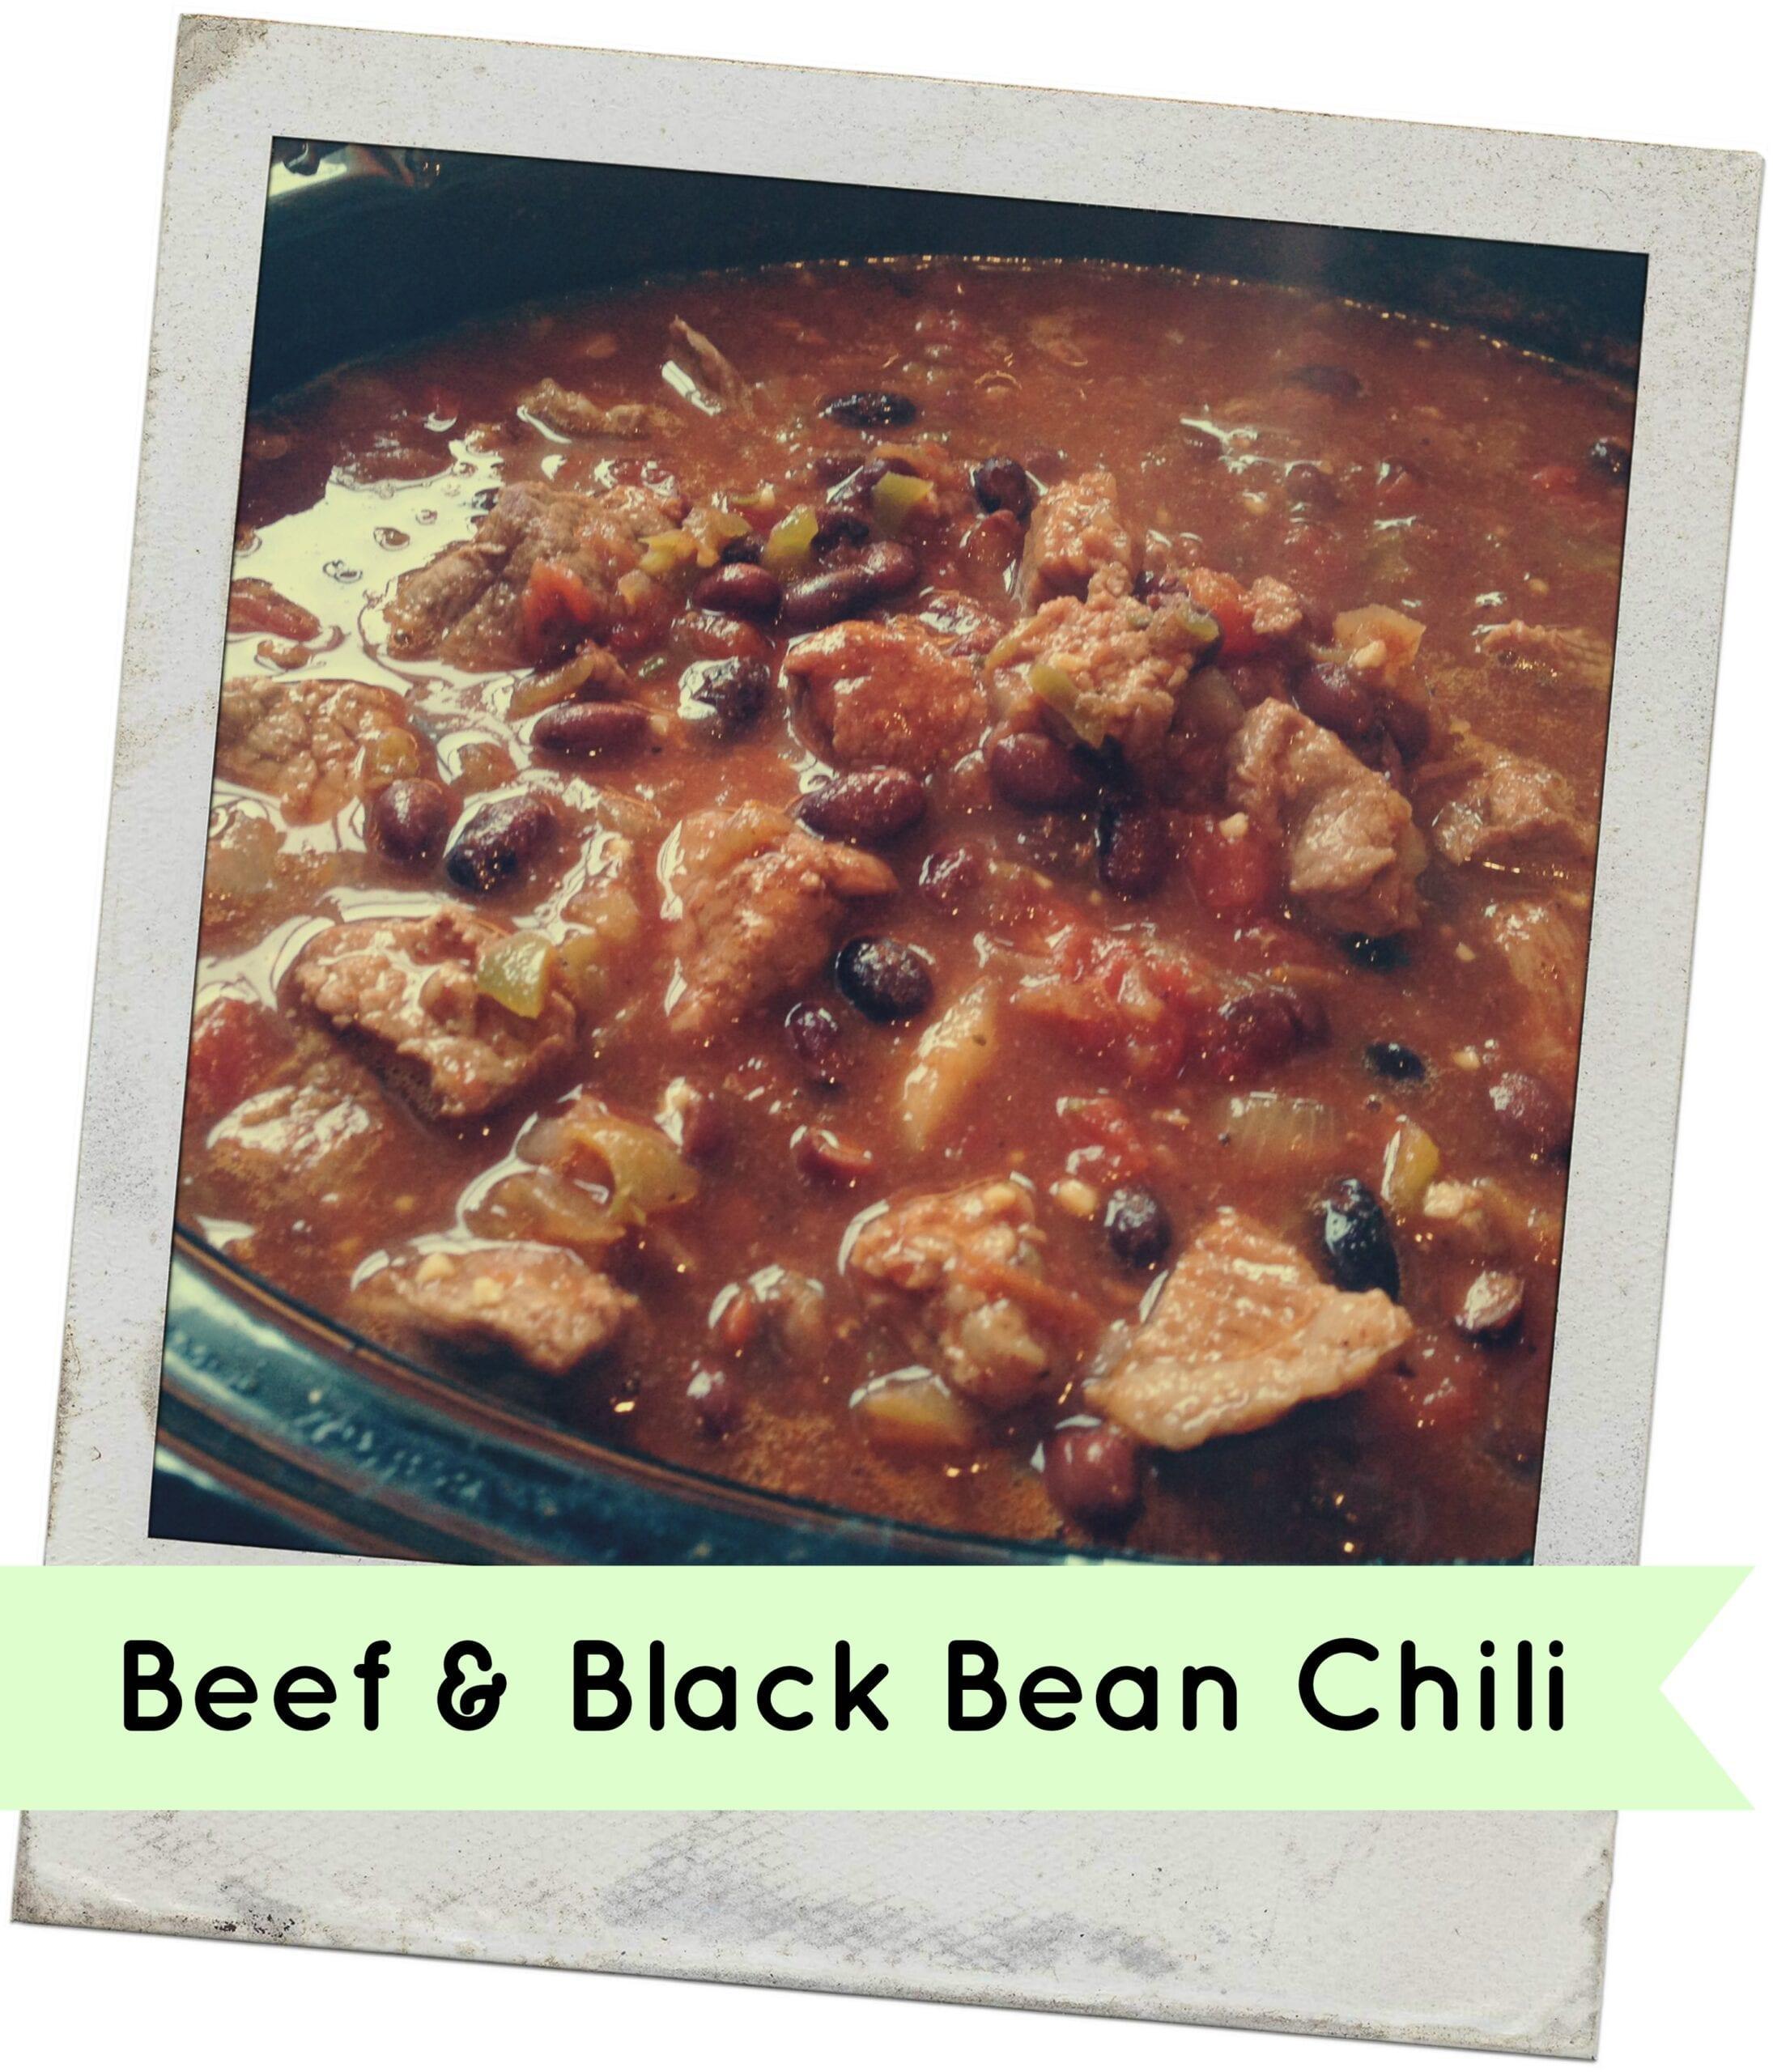 beef-black-bean chili